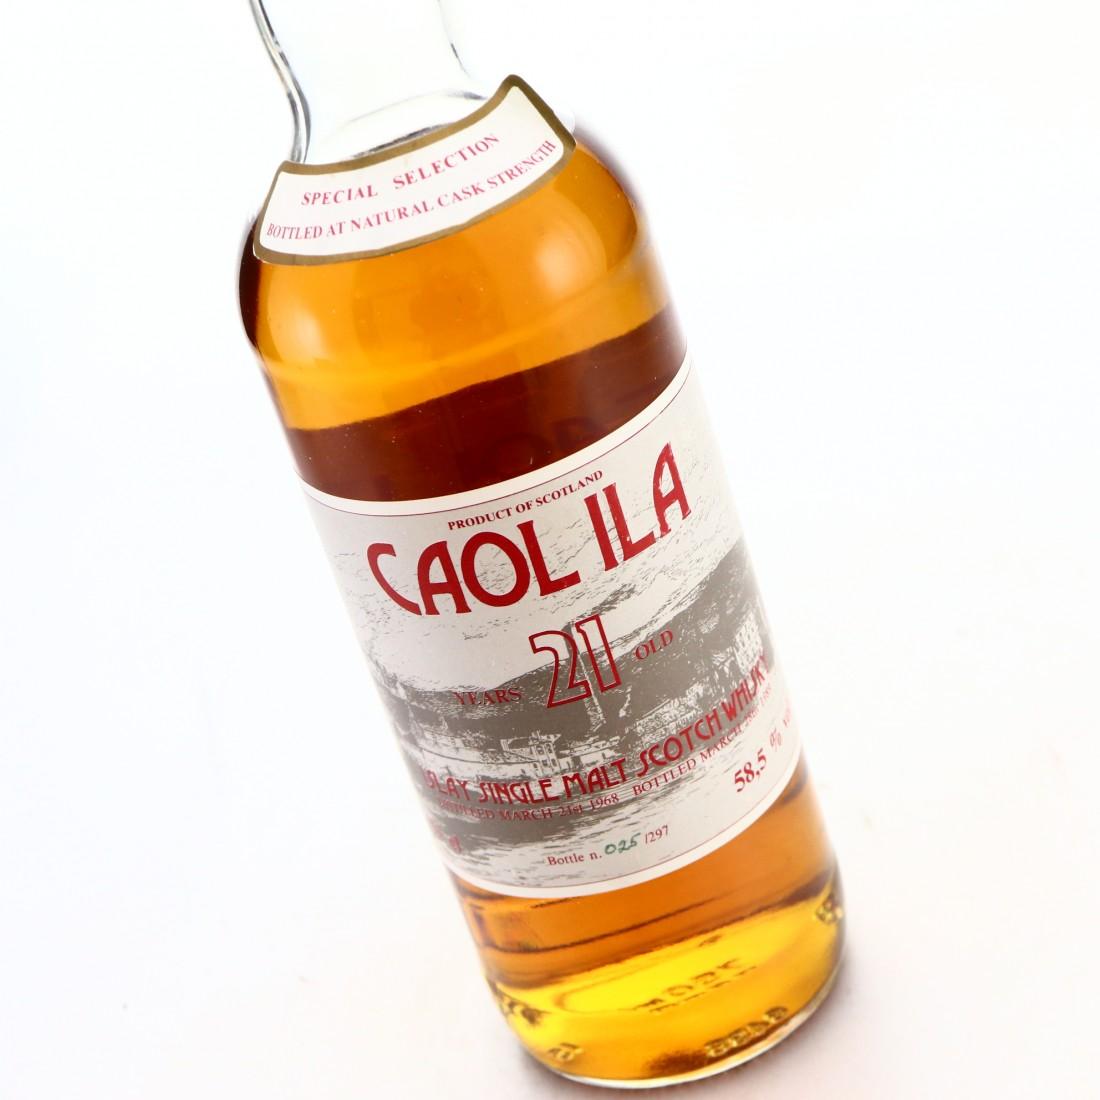 Caol Ila 1968 Intertrade 21 Year Old Cask Strength